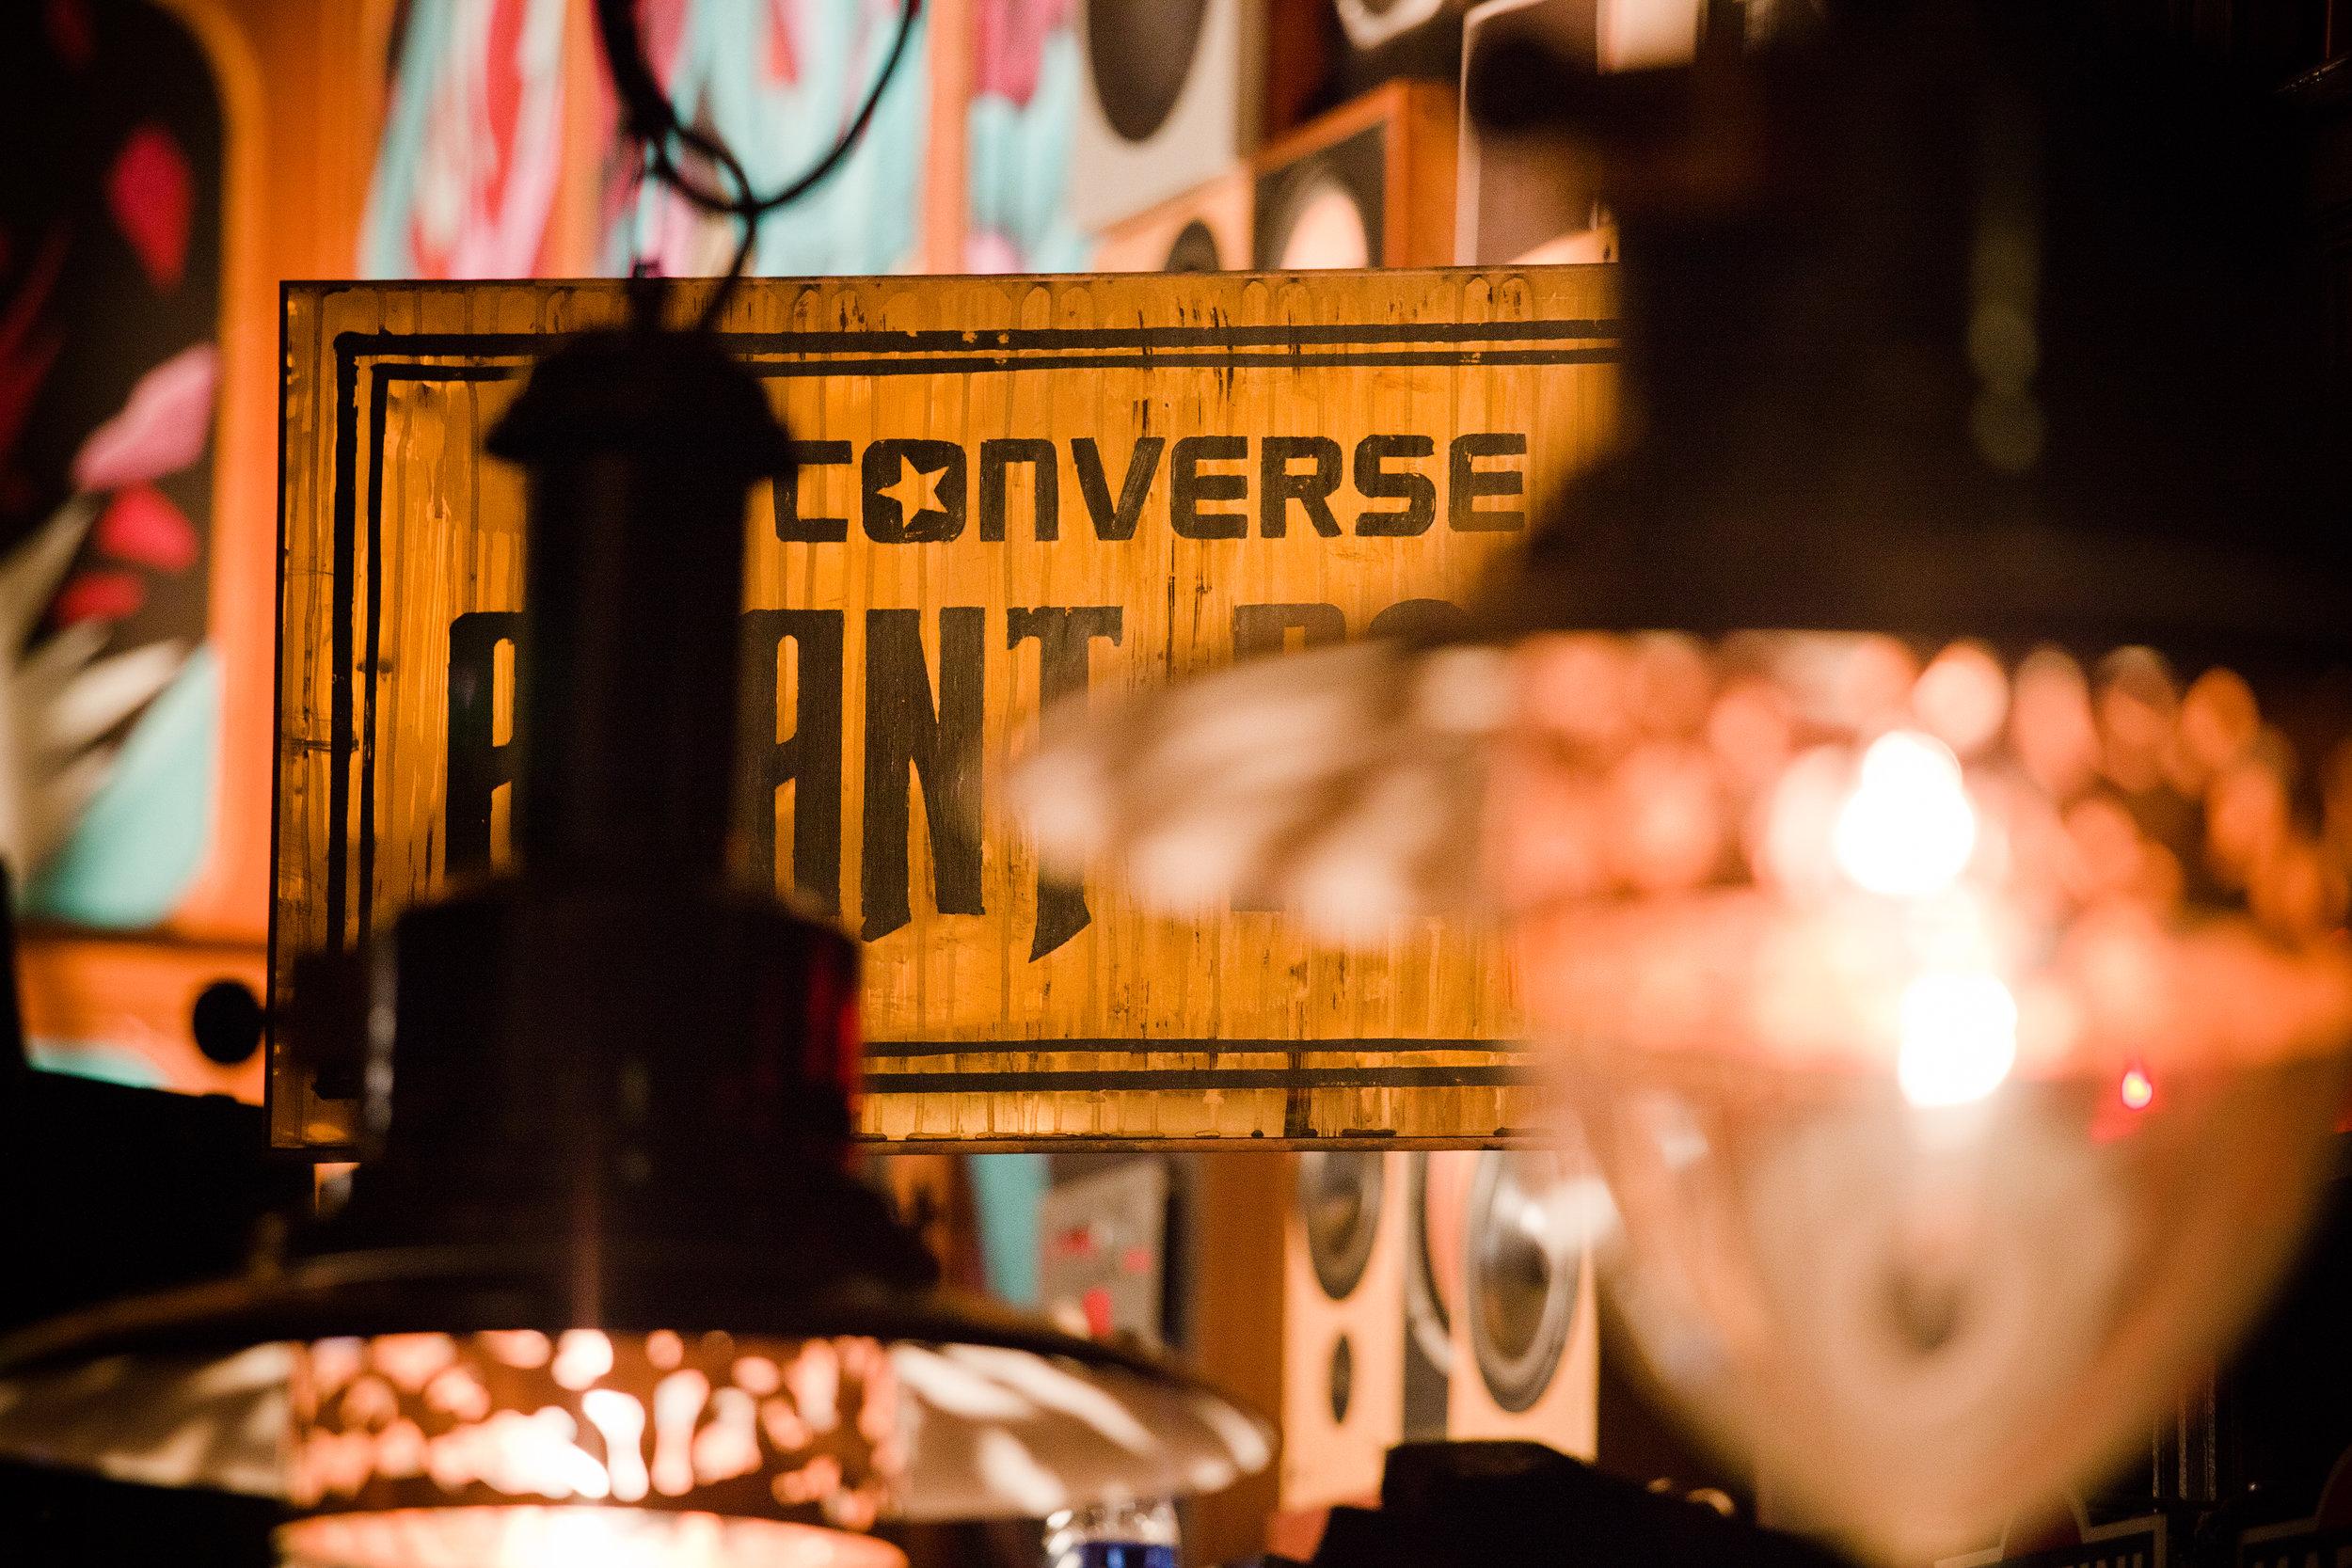 Converse Avant-Poste-7226.jpg